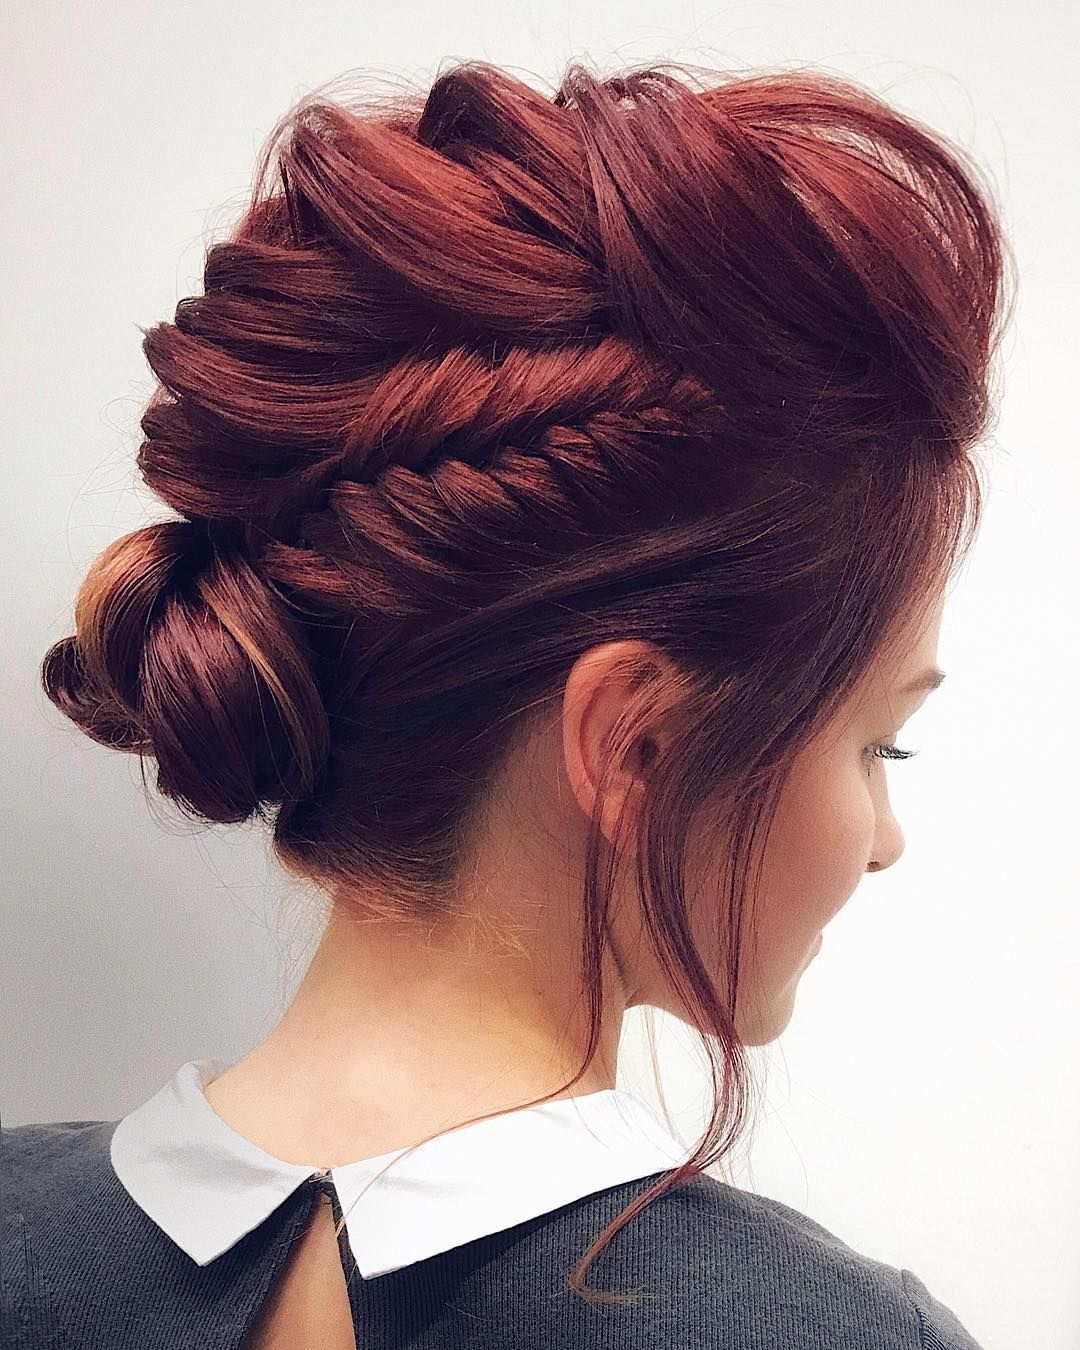 Braided Updo Wedding Hairstyles: Gorgeous Feminine Braided Updo Wedding Hairstyles